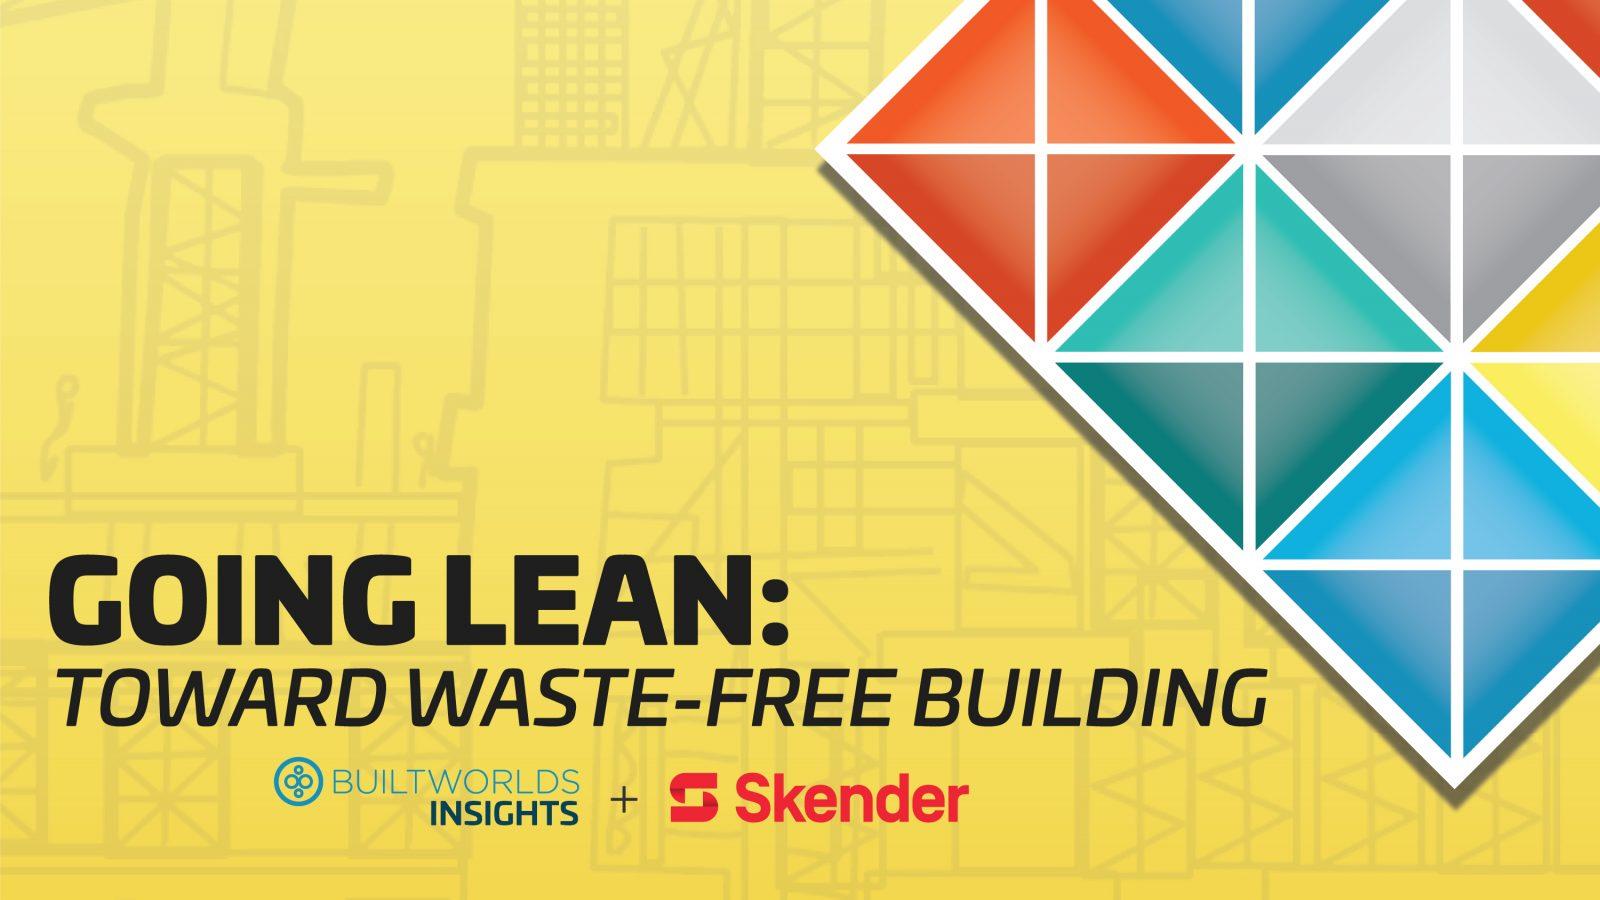 Skender News Media Harley Revolution X Engine Diagram And Builtworlds Release Going Lean Toward Waste Free Building Report